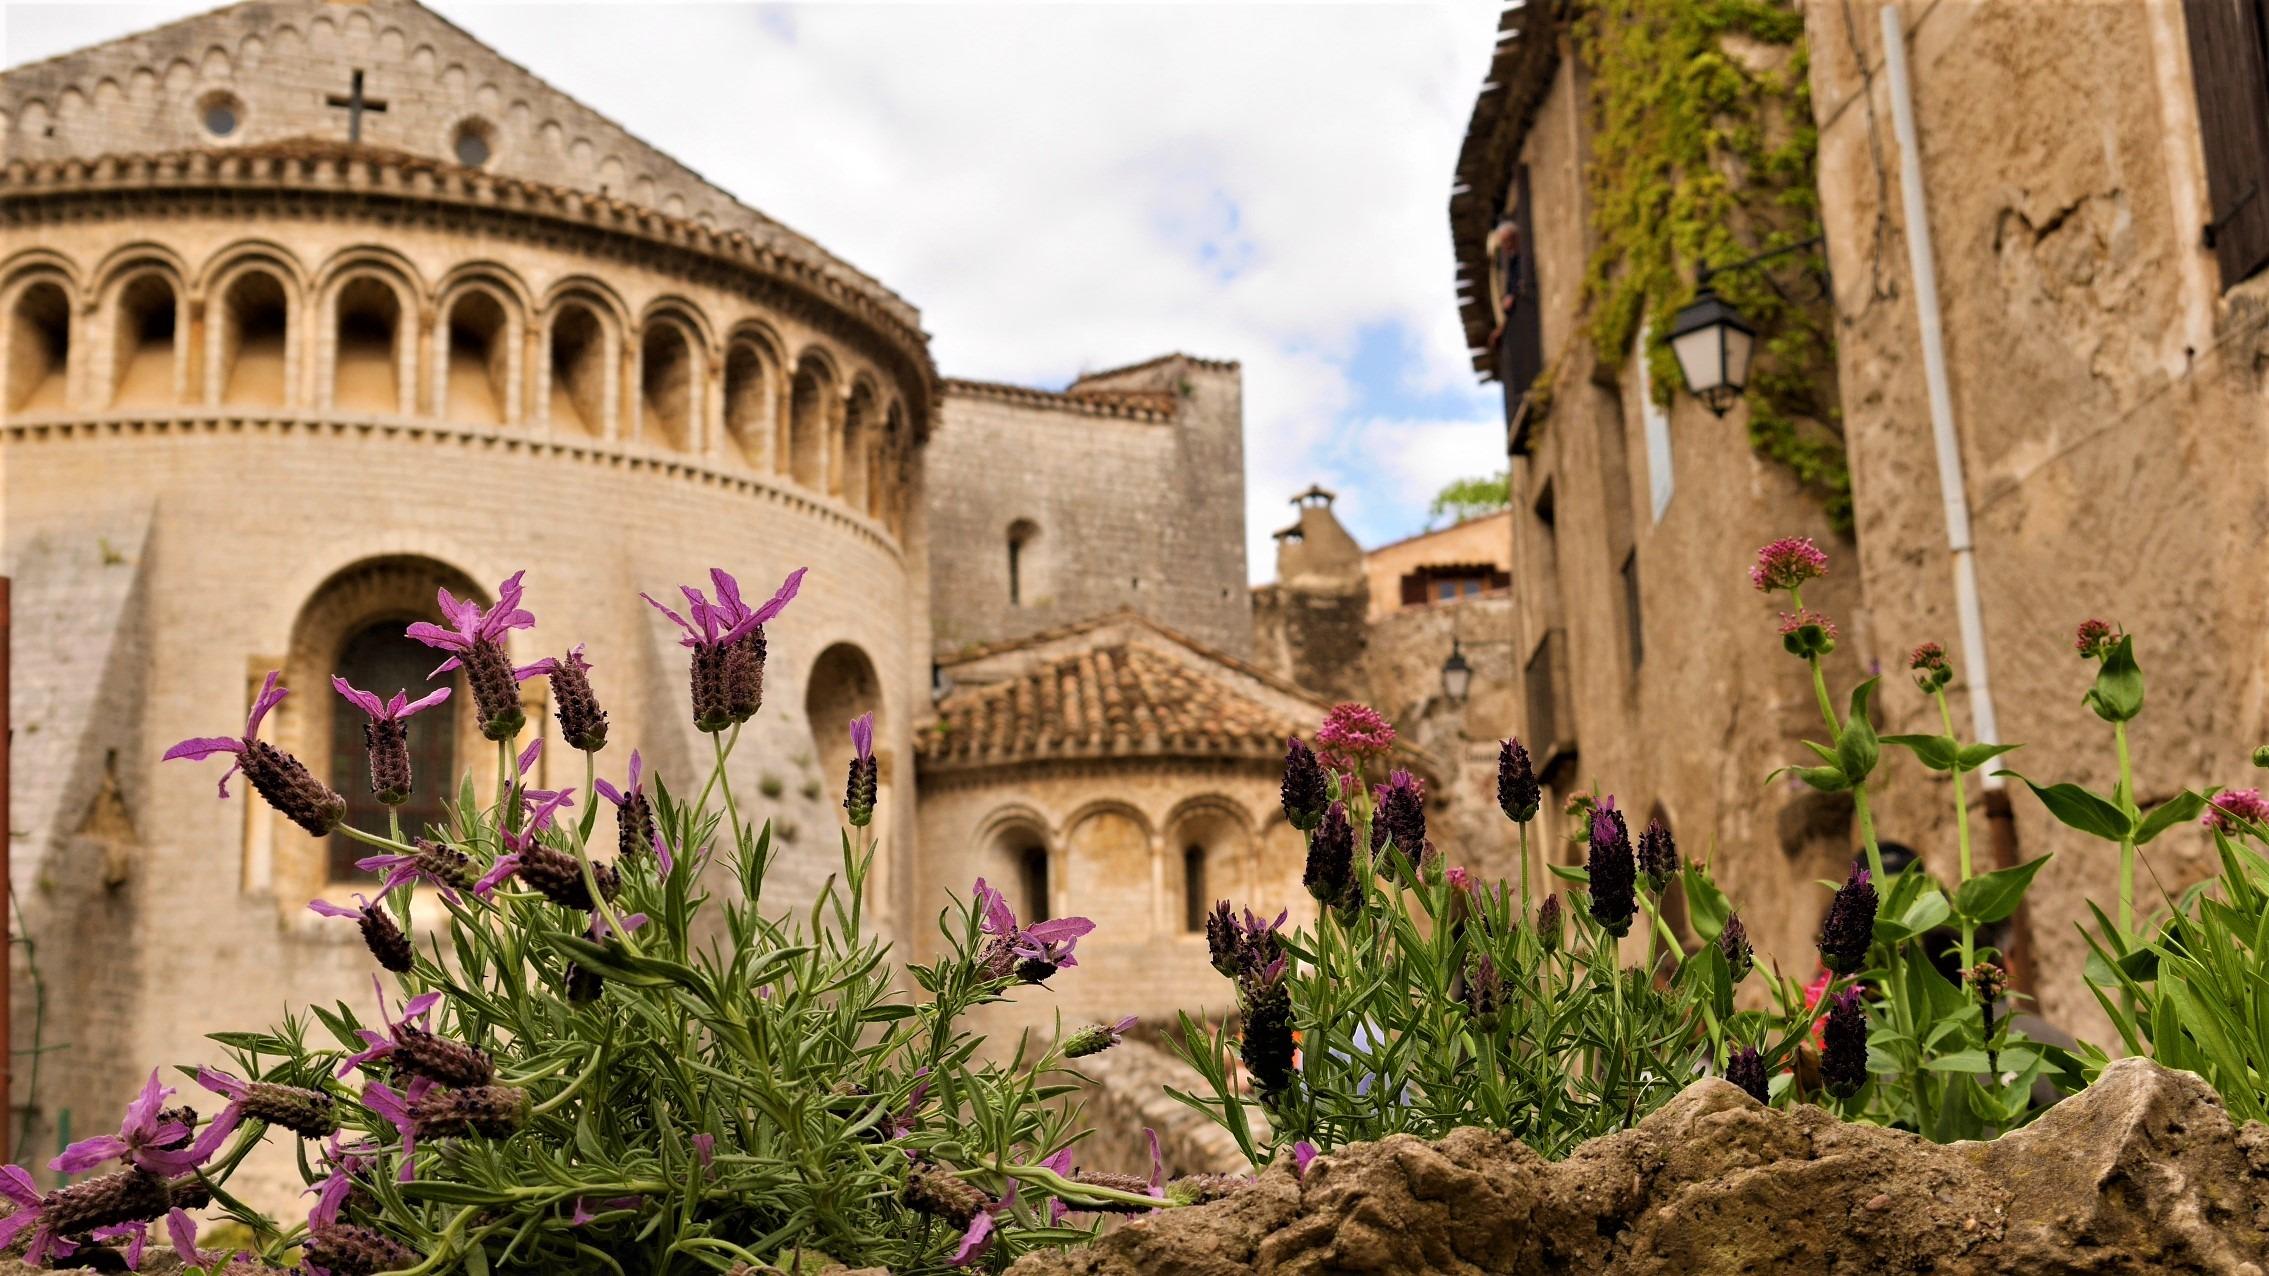 Saint Guilhem Desert abbaye Gellone visiter infos pratiques blog voyage france arpenter le chemin